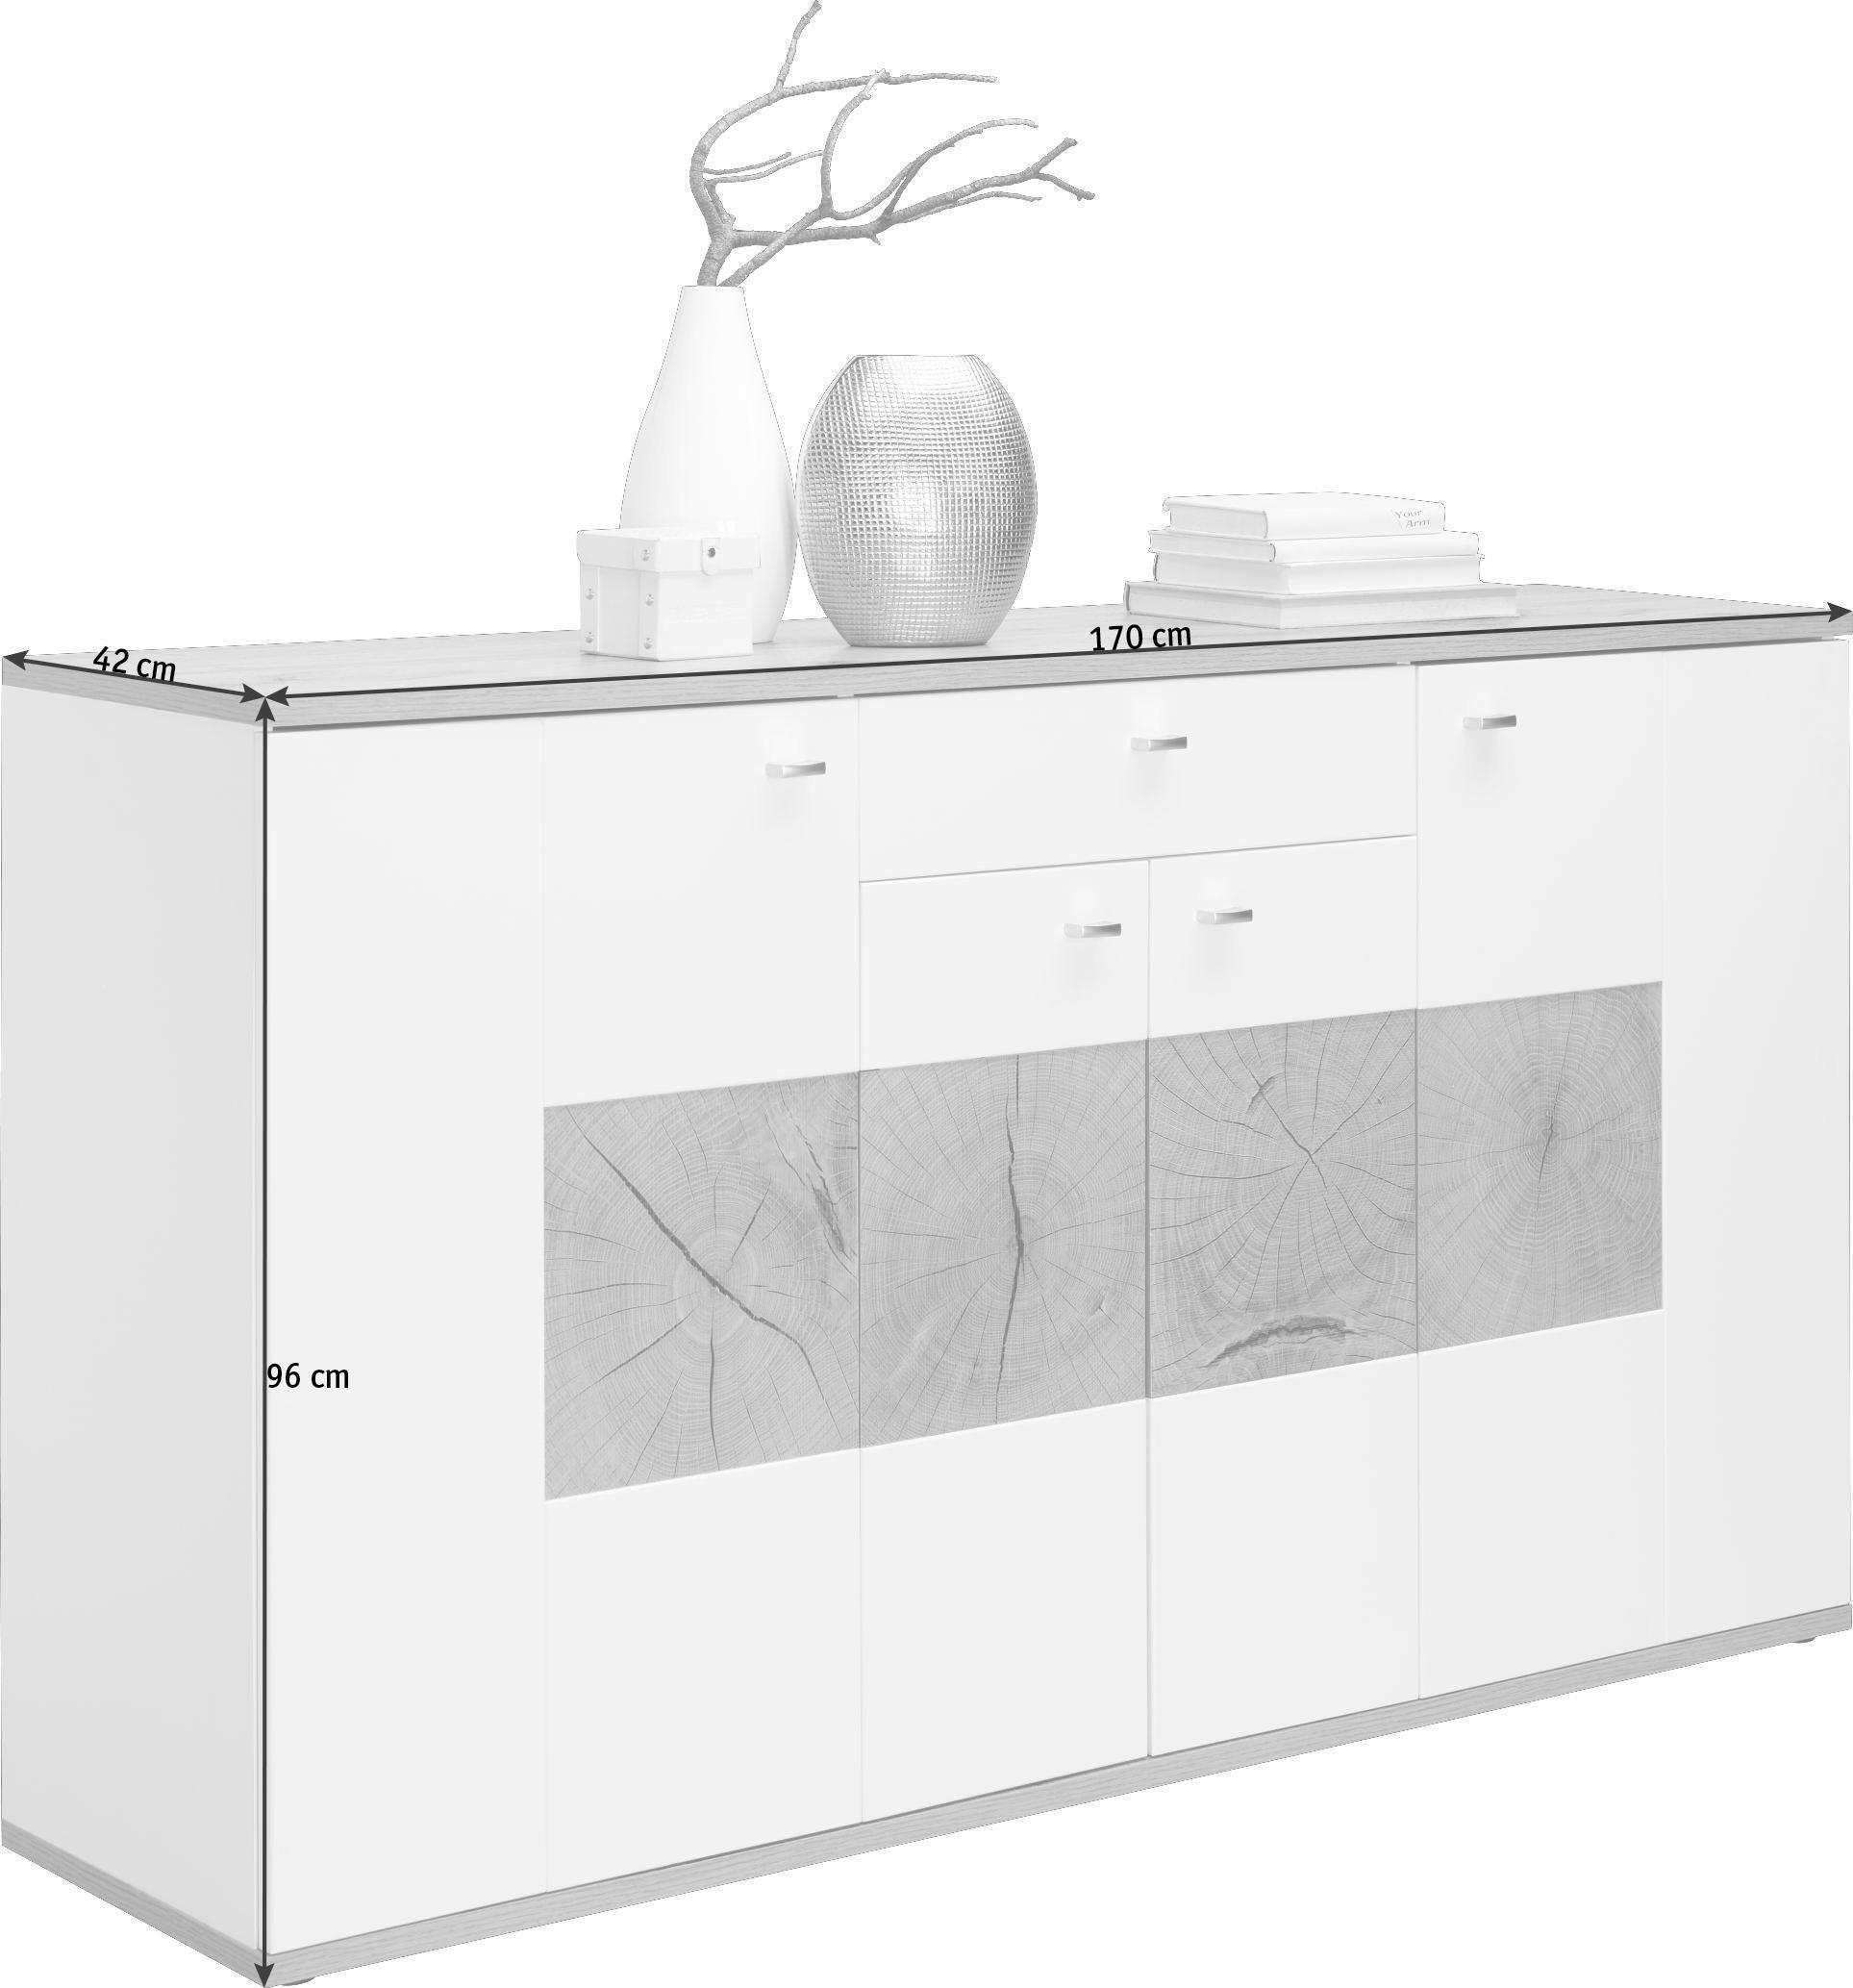 KOMODA SIDEBOARD - bílá/barvy stříbra, Design, kov/dřevěný materiál (170/96/42cm) - HOM IN